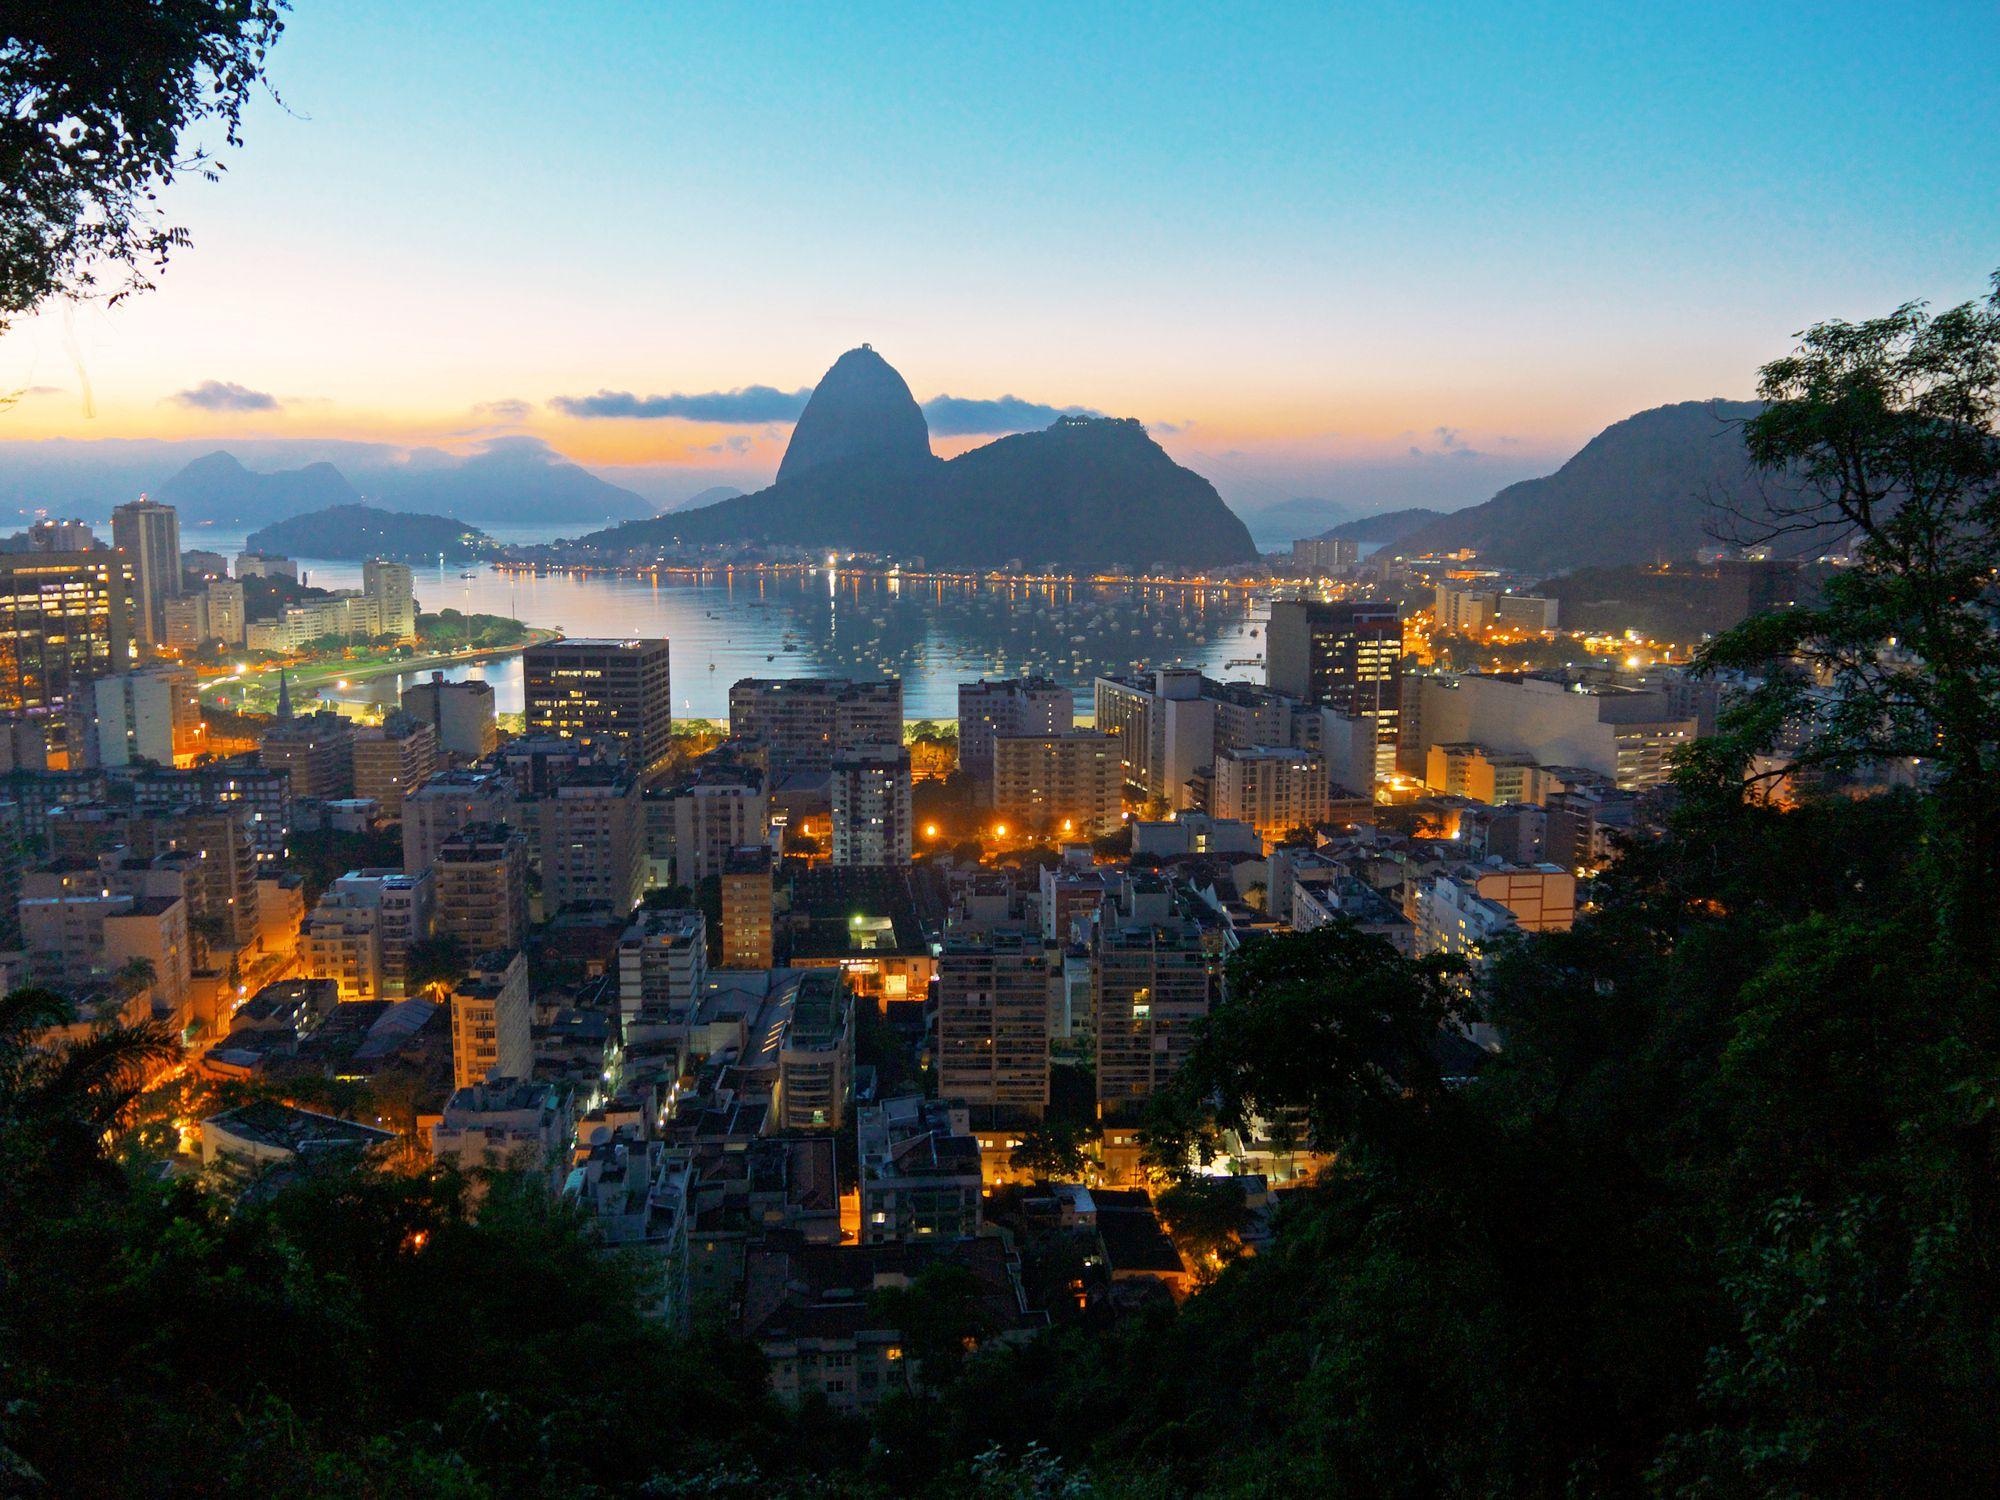 The Top 12 Neighborhoods to Explore in Rio de Janeiro